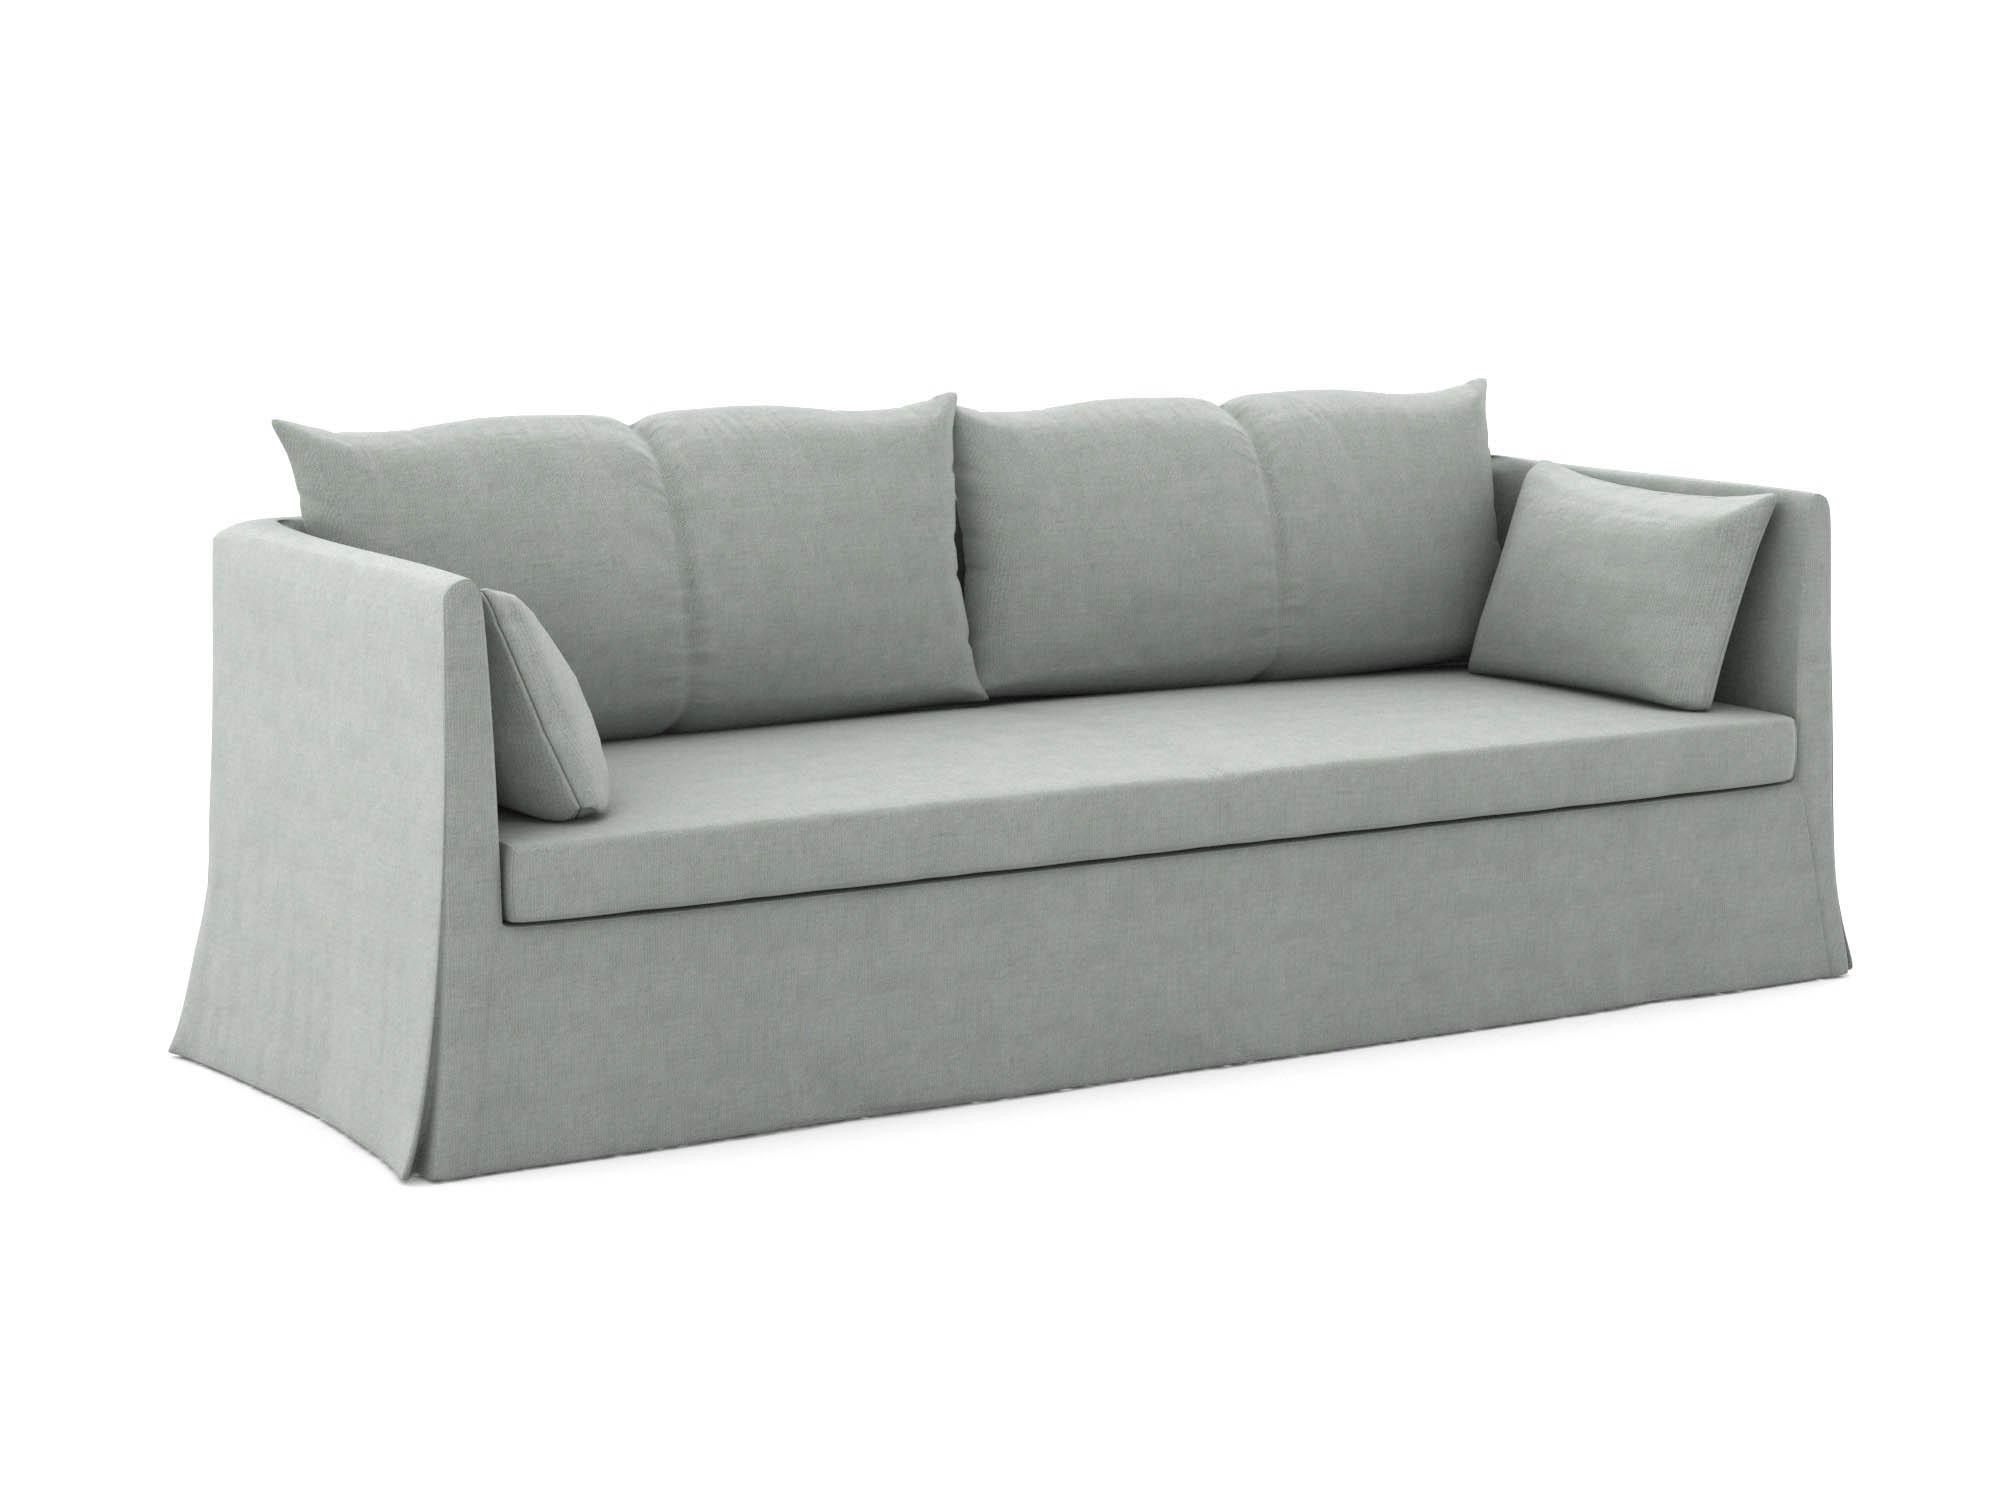 Sandbacken 3-seater sofa cover | vidian-design.com